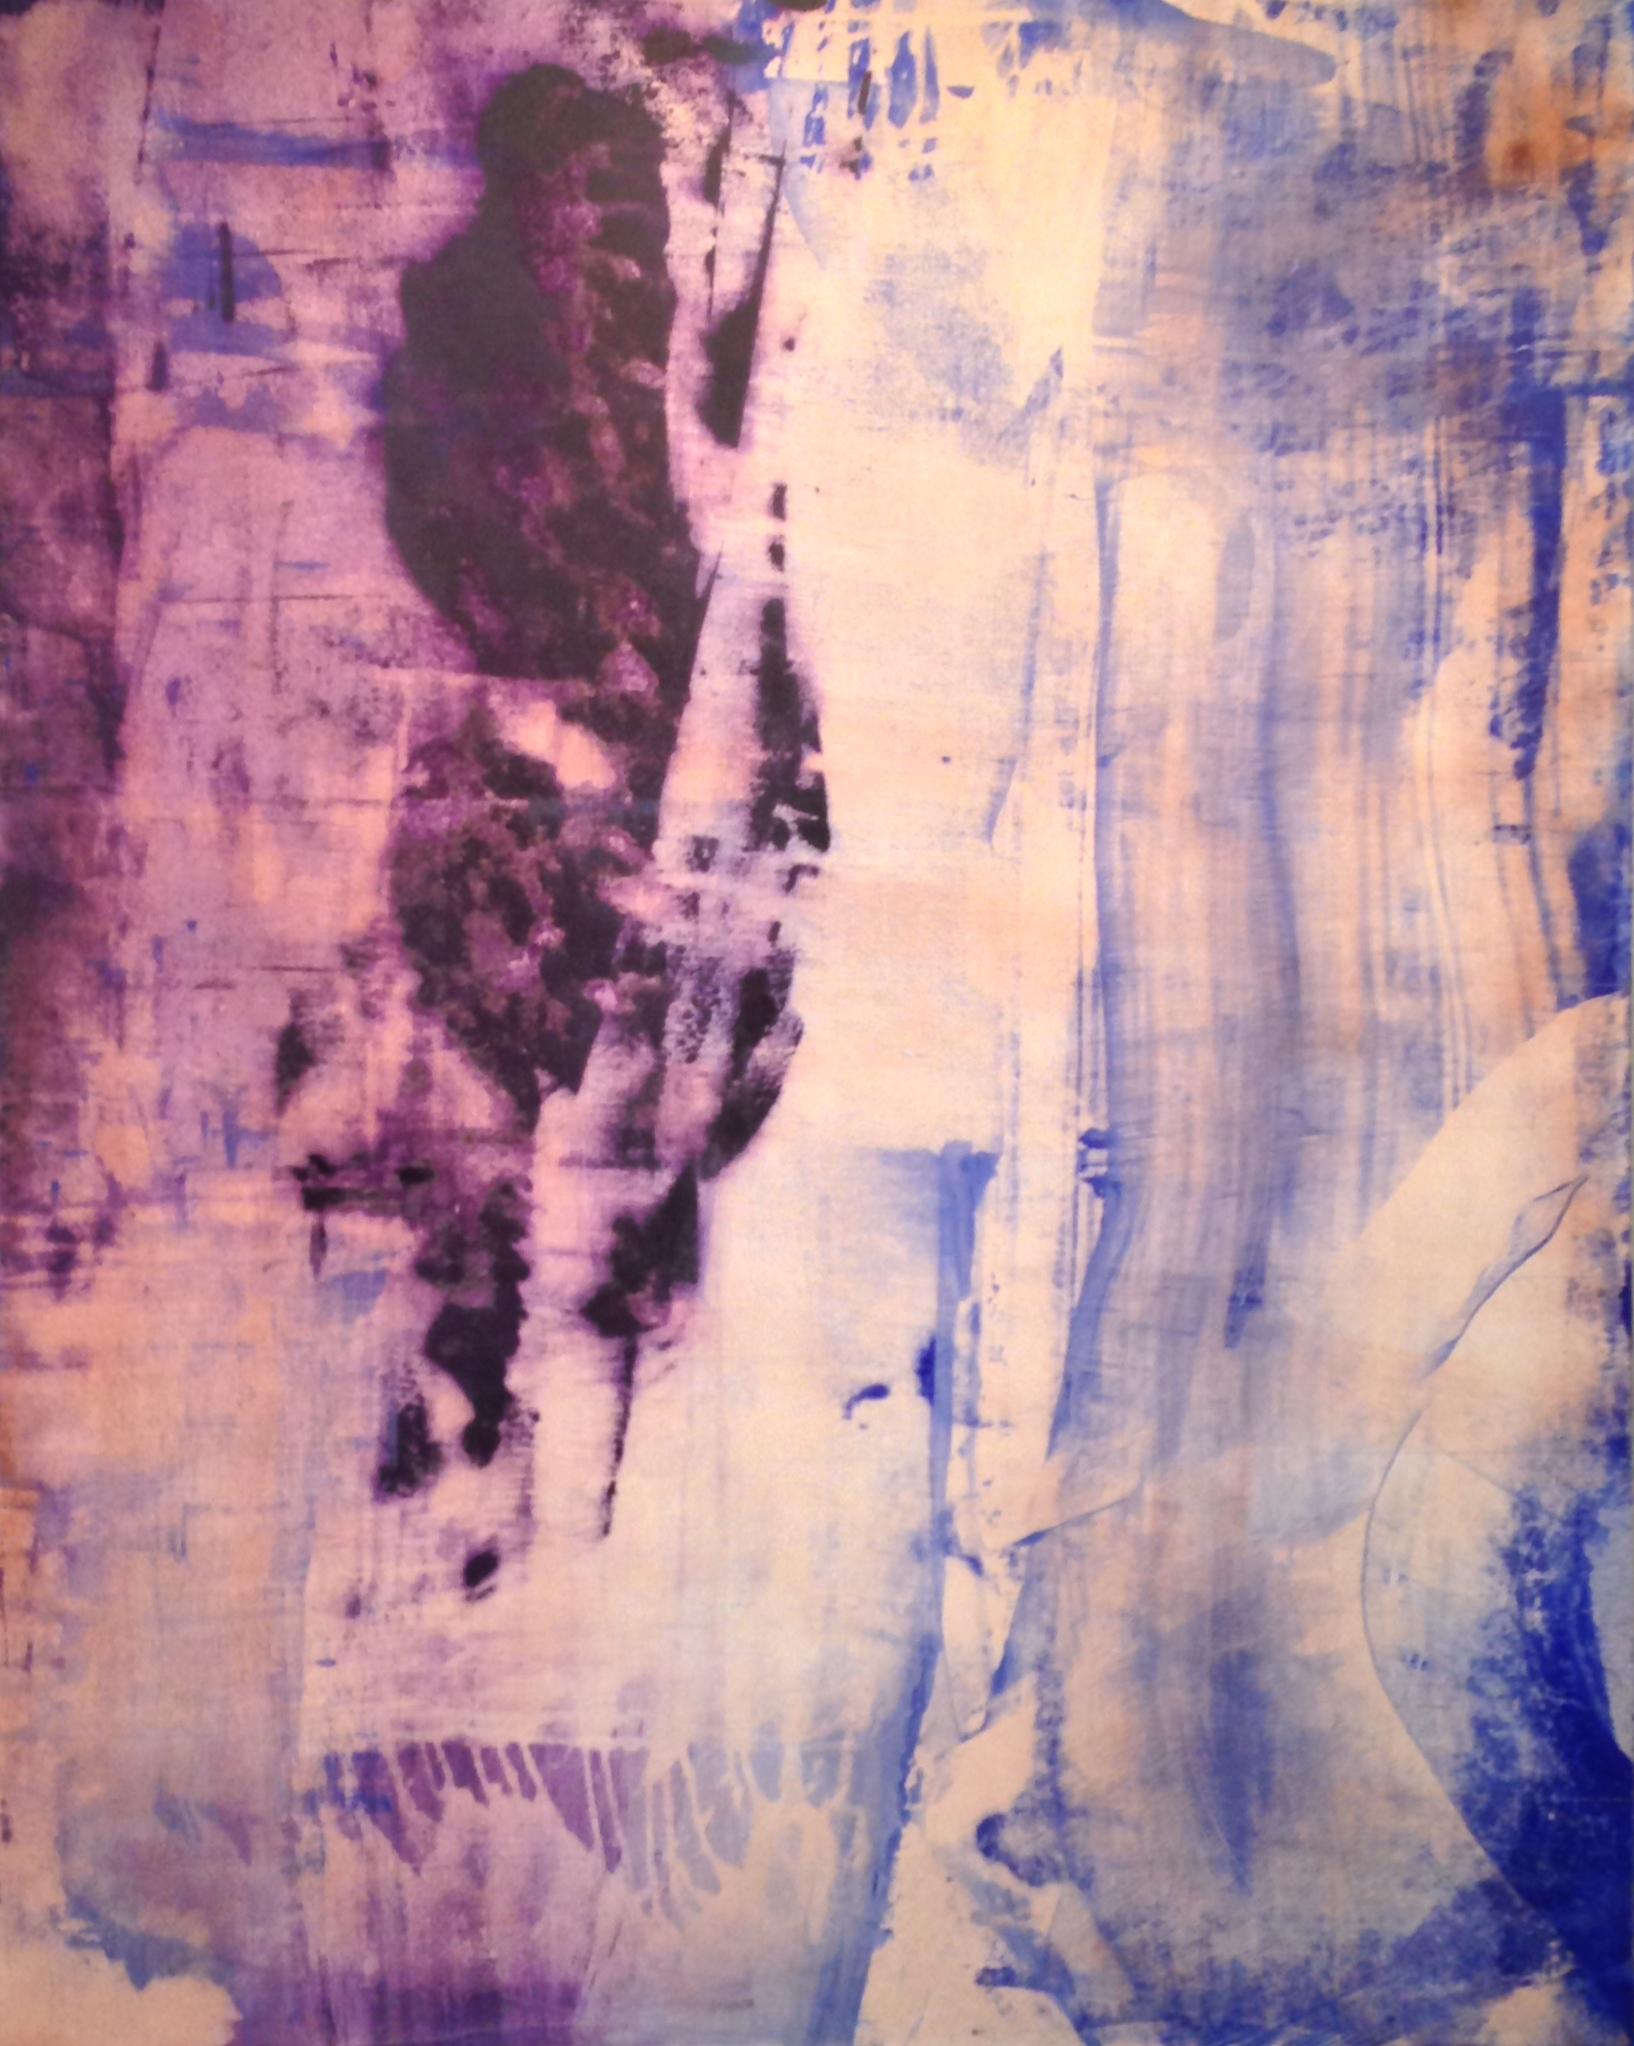 "1530, oil and acrylic on canvas, 60"" x 48"", $5,000"